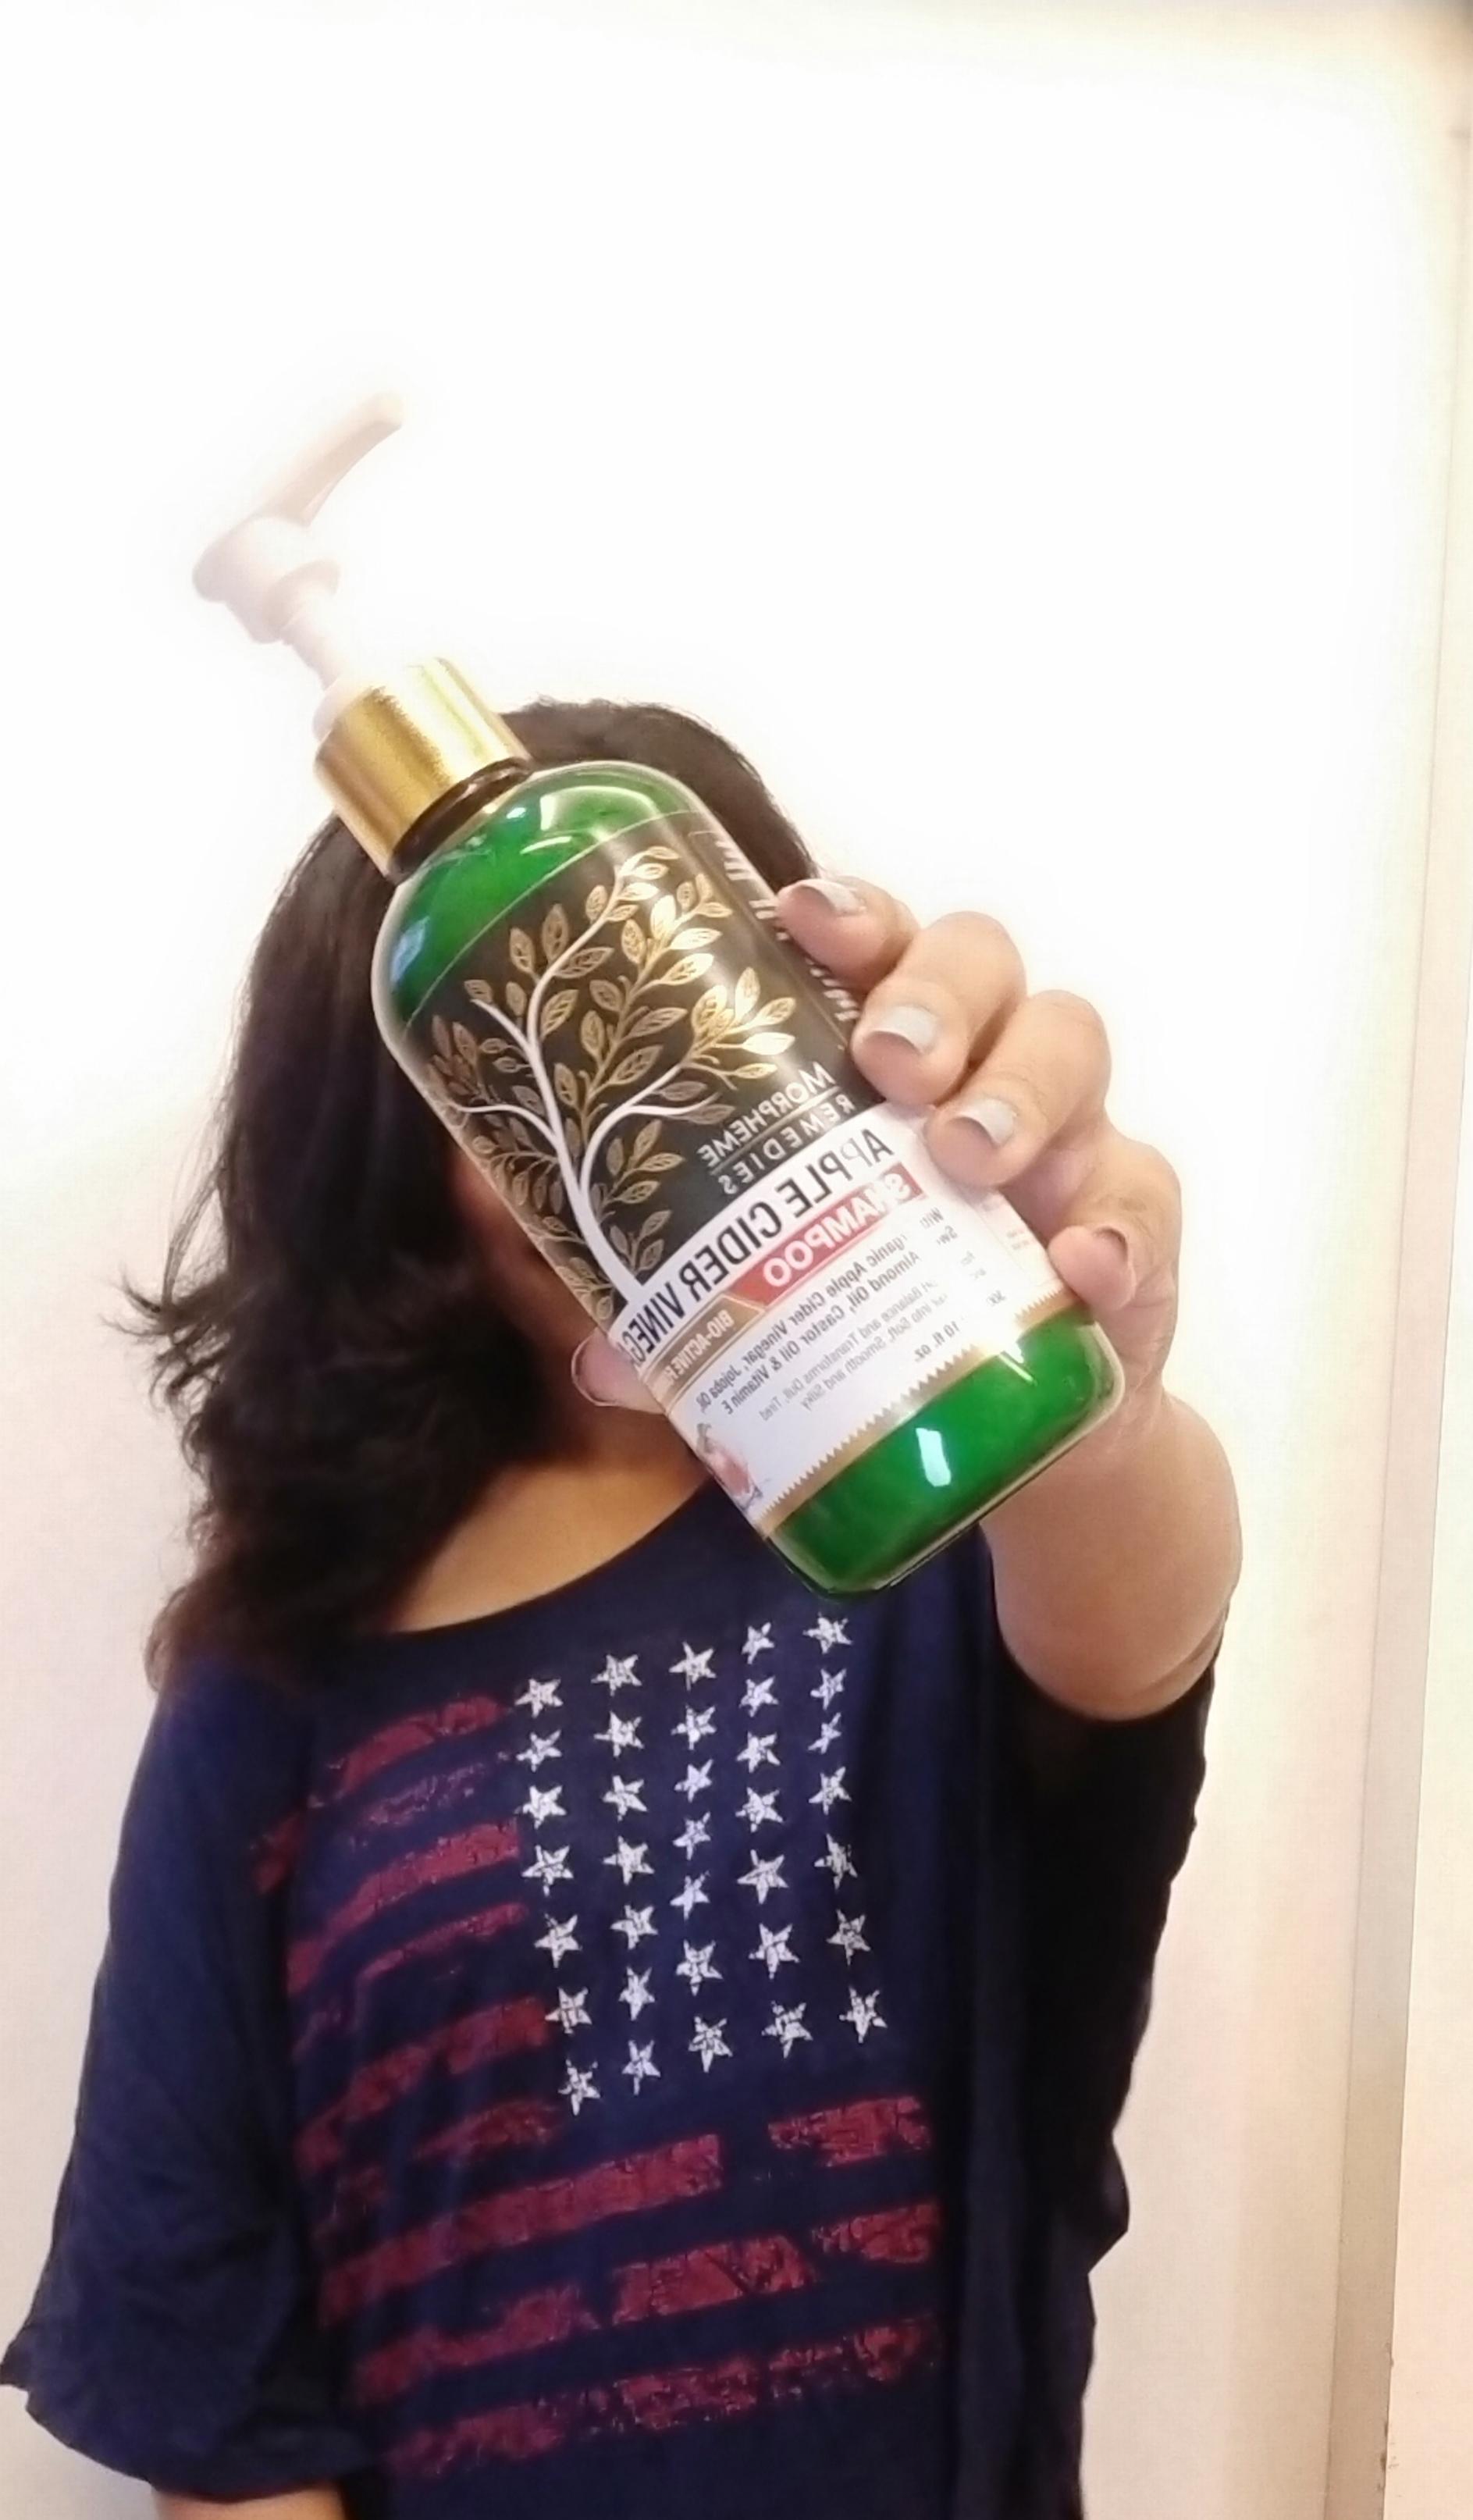 Morpheme Remedies Apple Cider Vinegar Shampoo -Love it-By ishitas